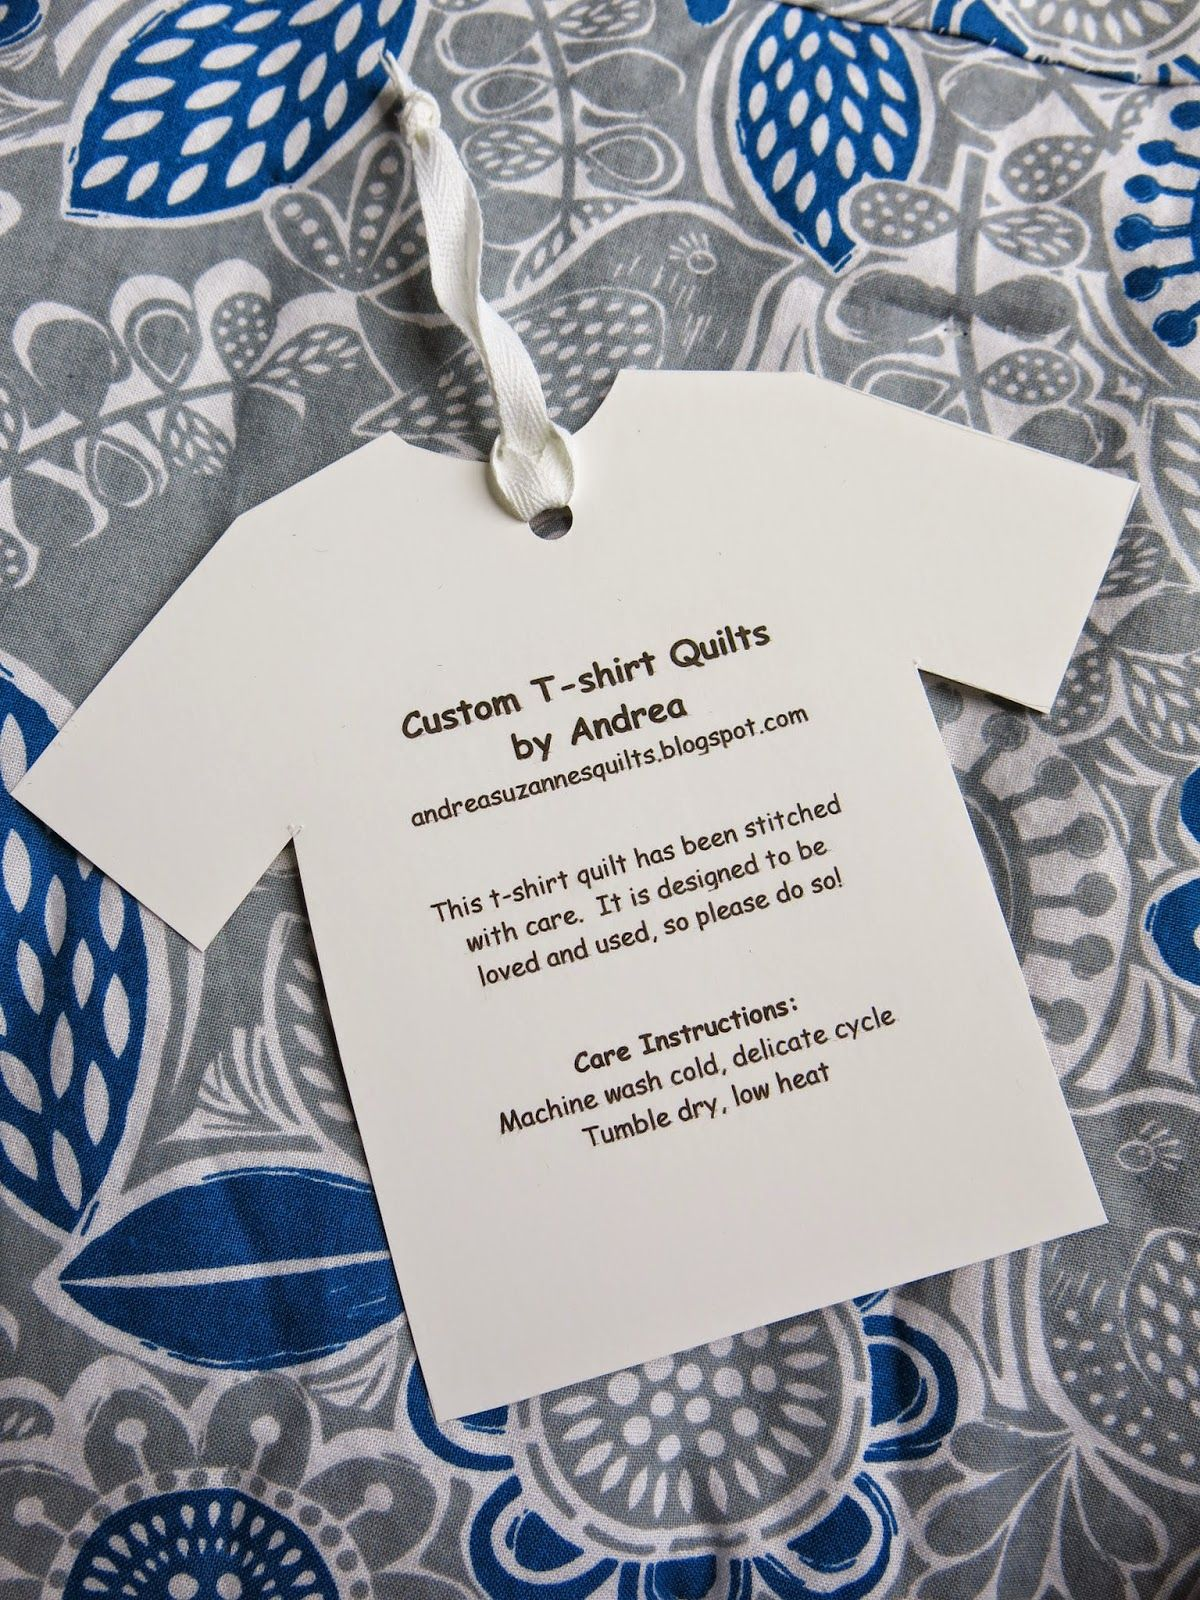 T-shirt quilt design instructions - Care Instructions For T Shirt Quilts By Andrea Quilts